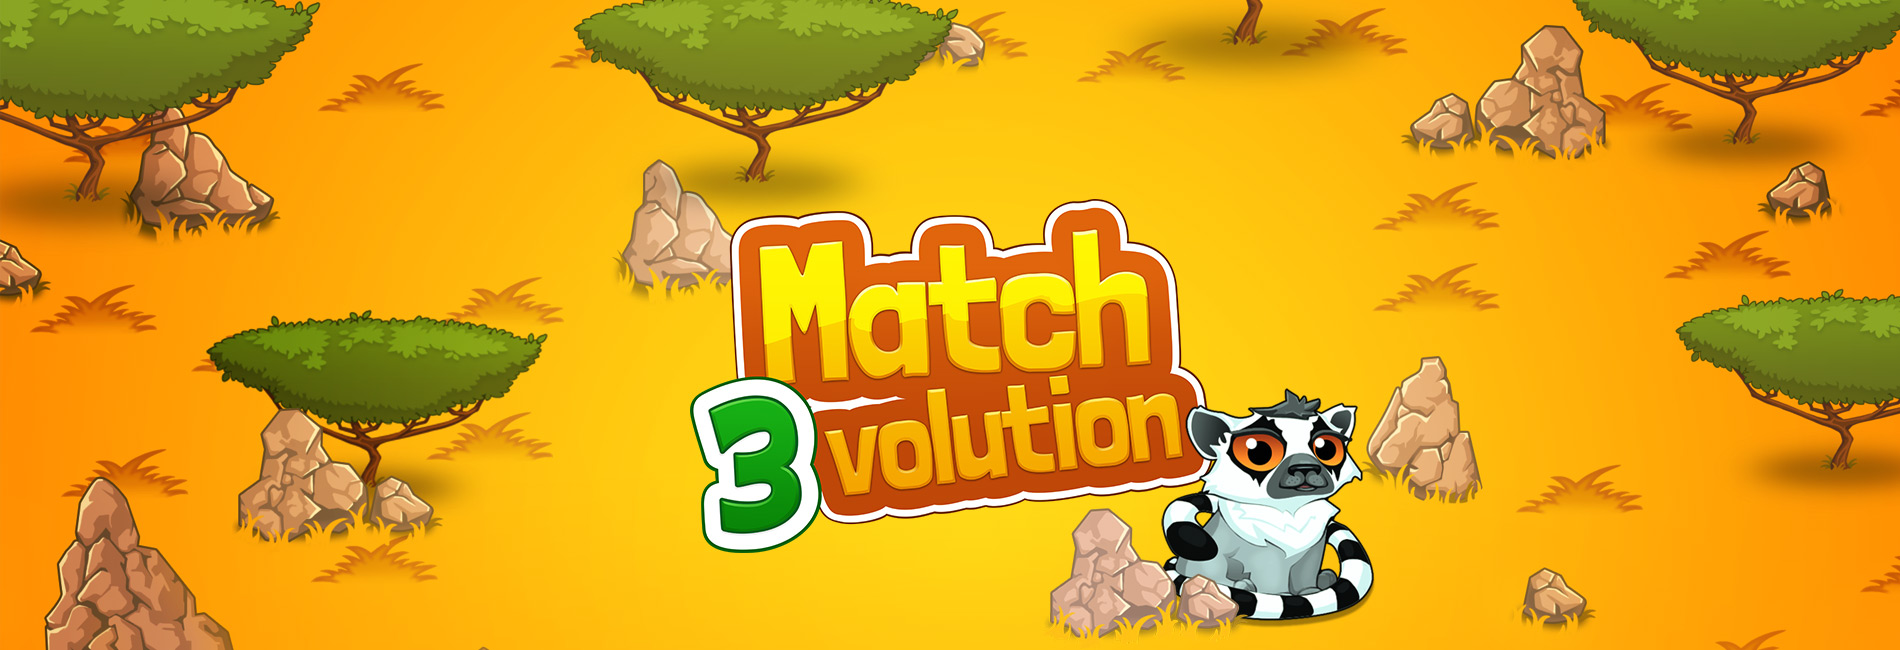 Match 3volution